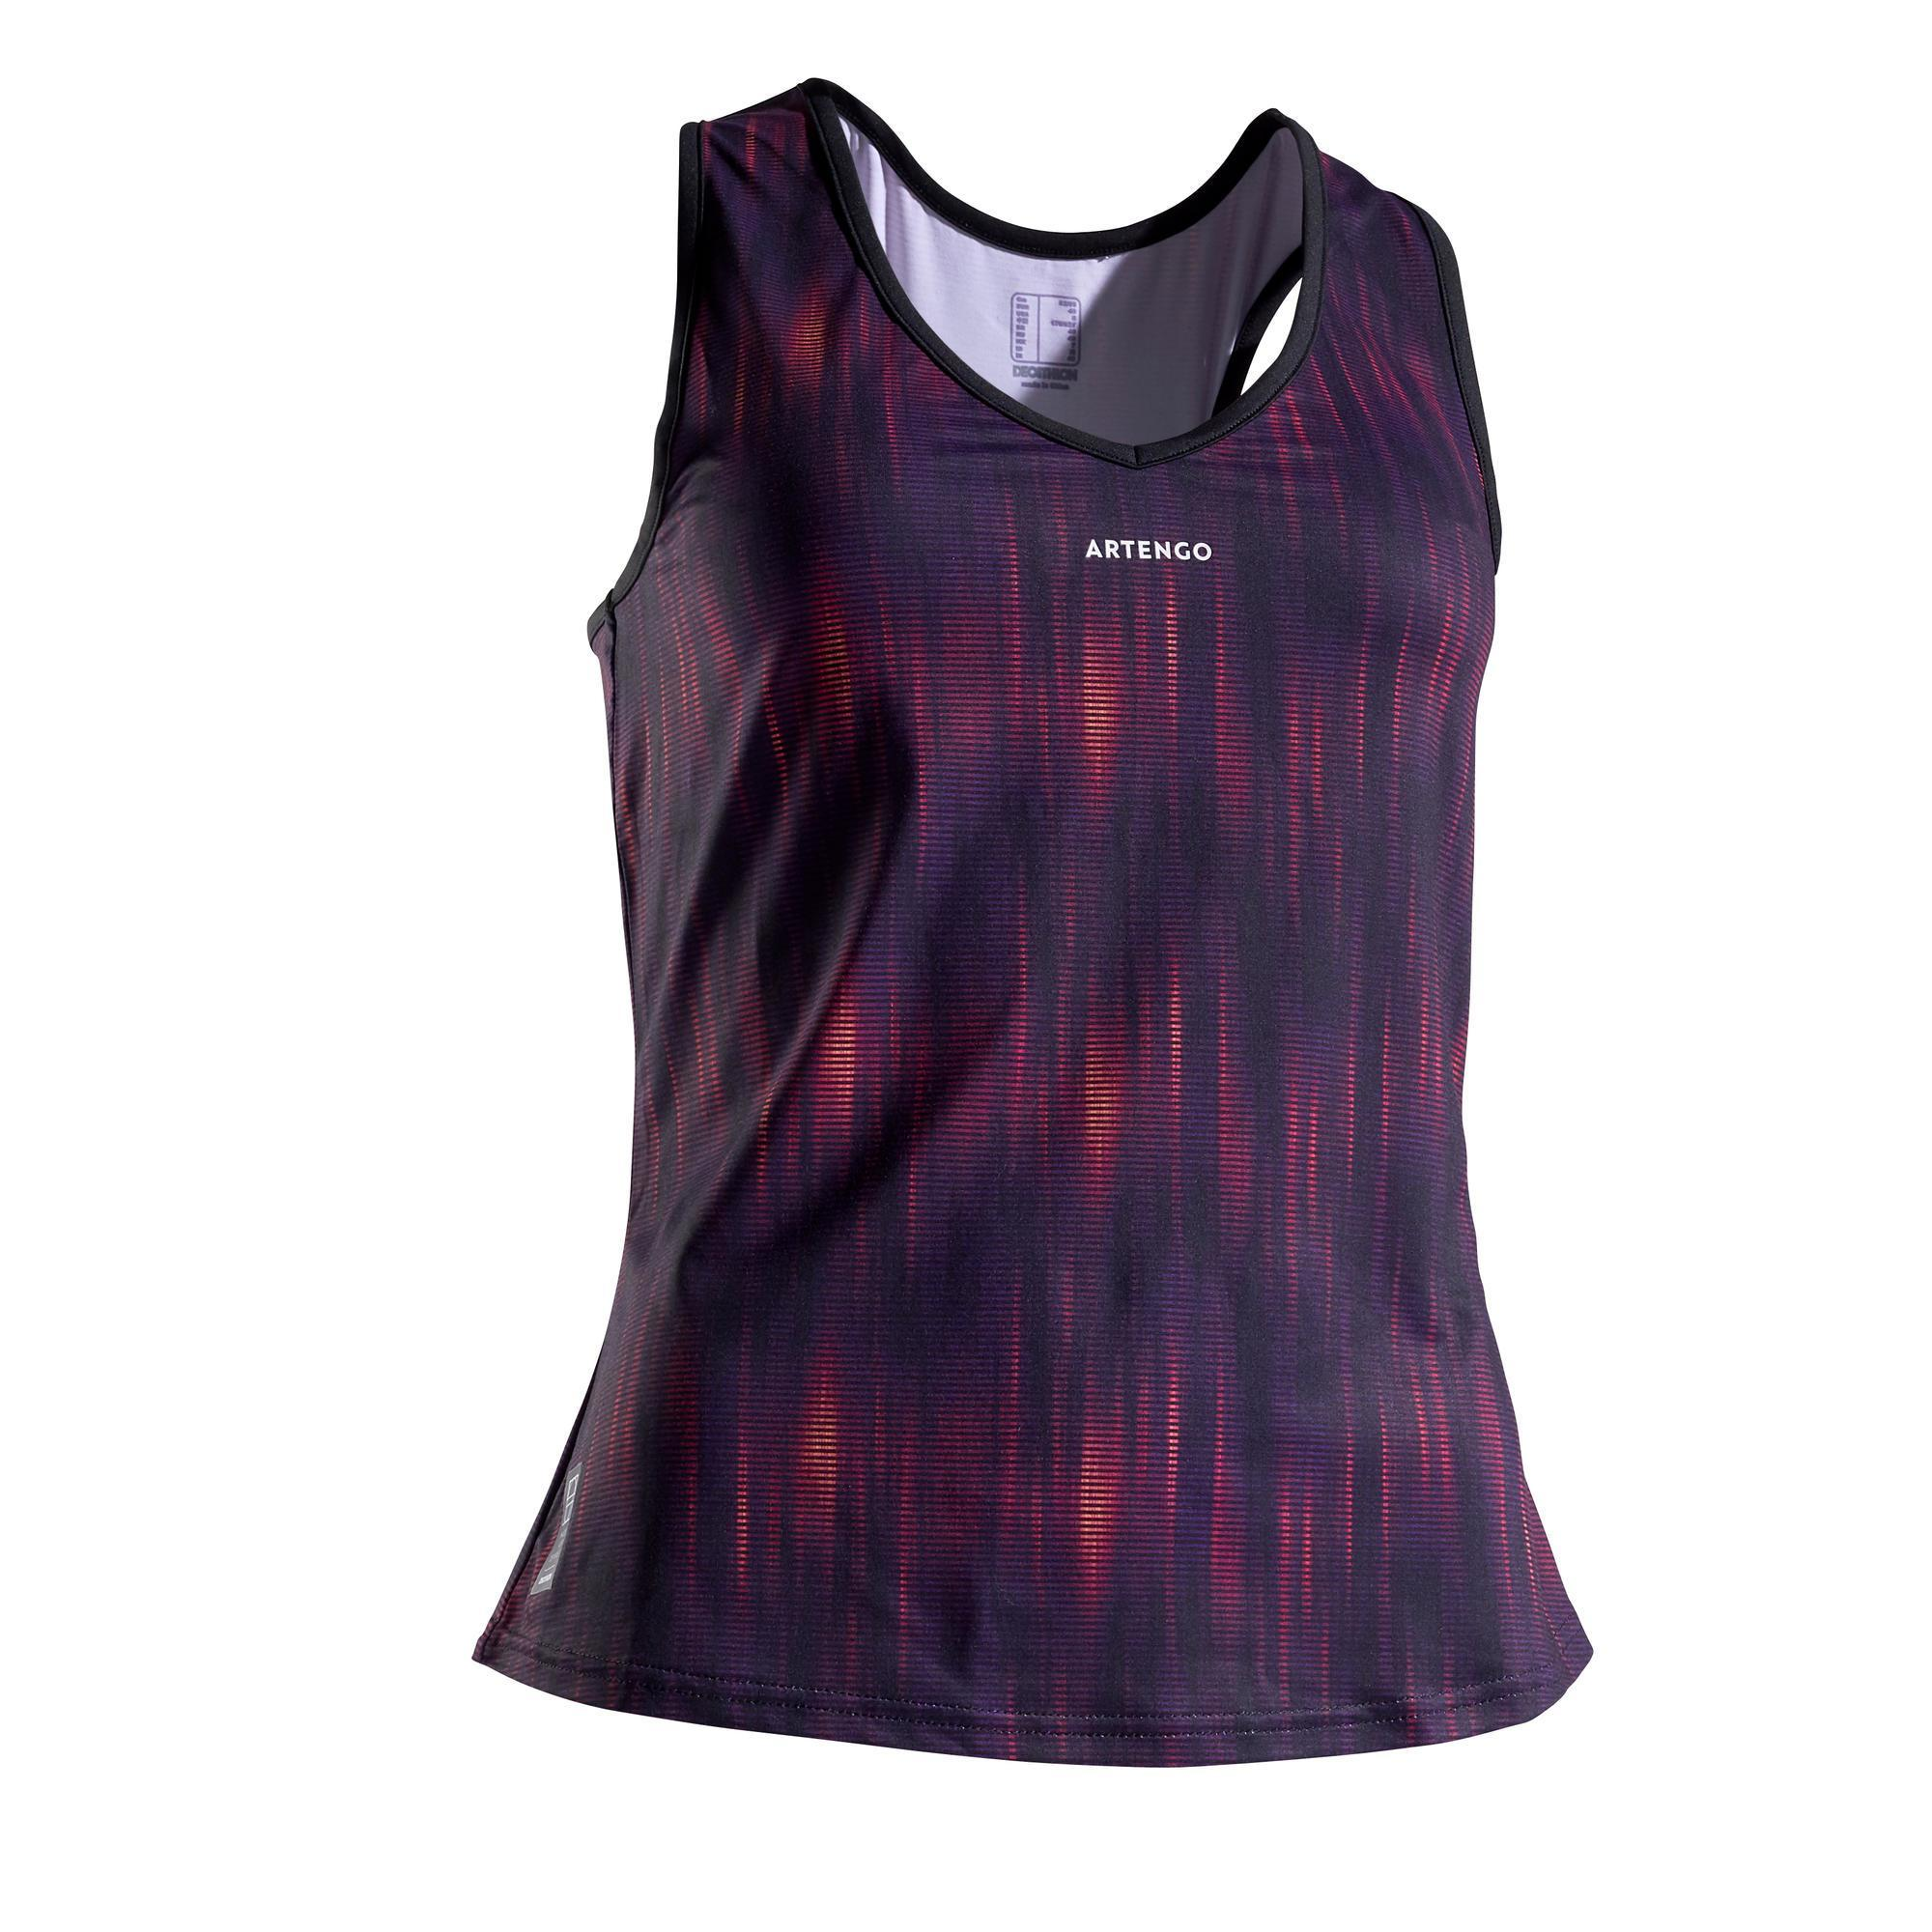 Tennis-Top TK Light 900 Damen violett/orange | Sportbekleidung > Sporttops > Tennistops | Orange - Rosa - Violett | Artengo